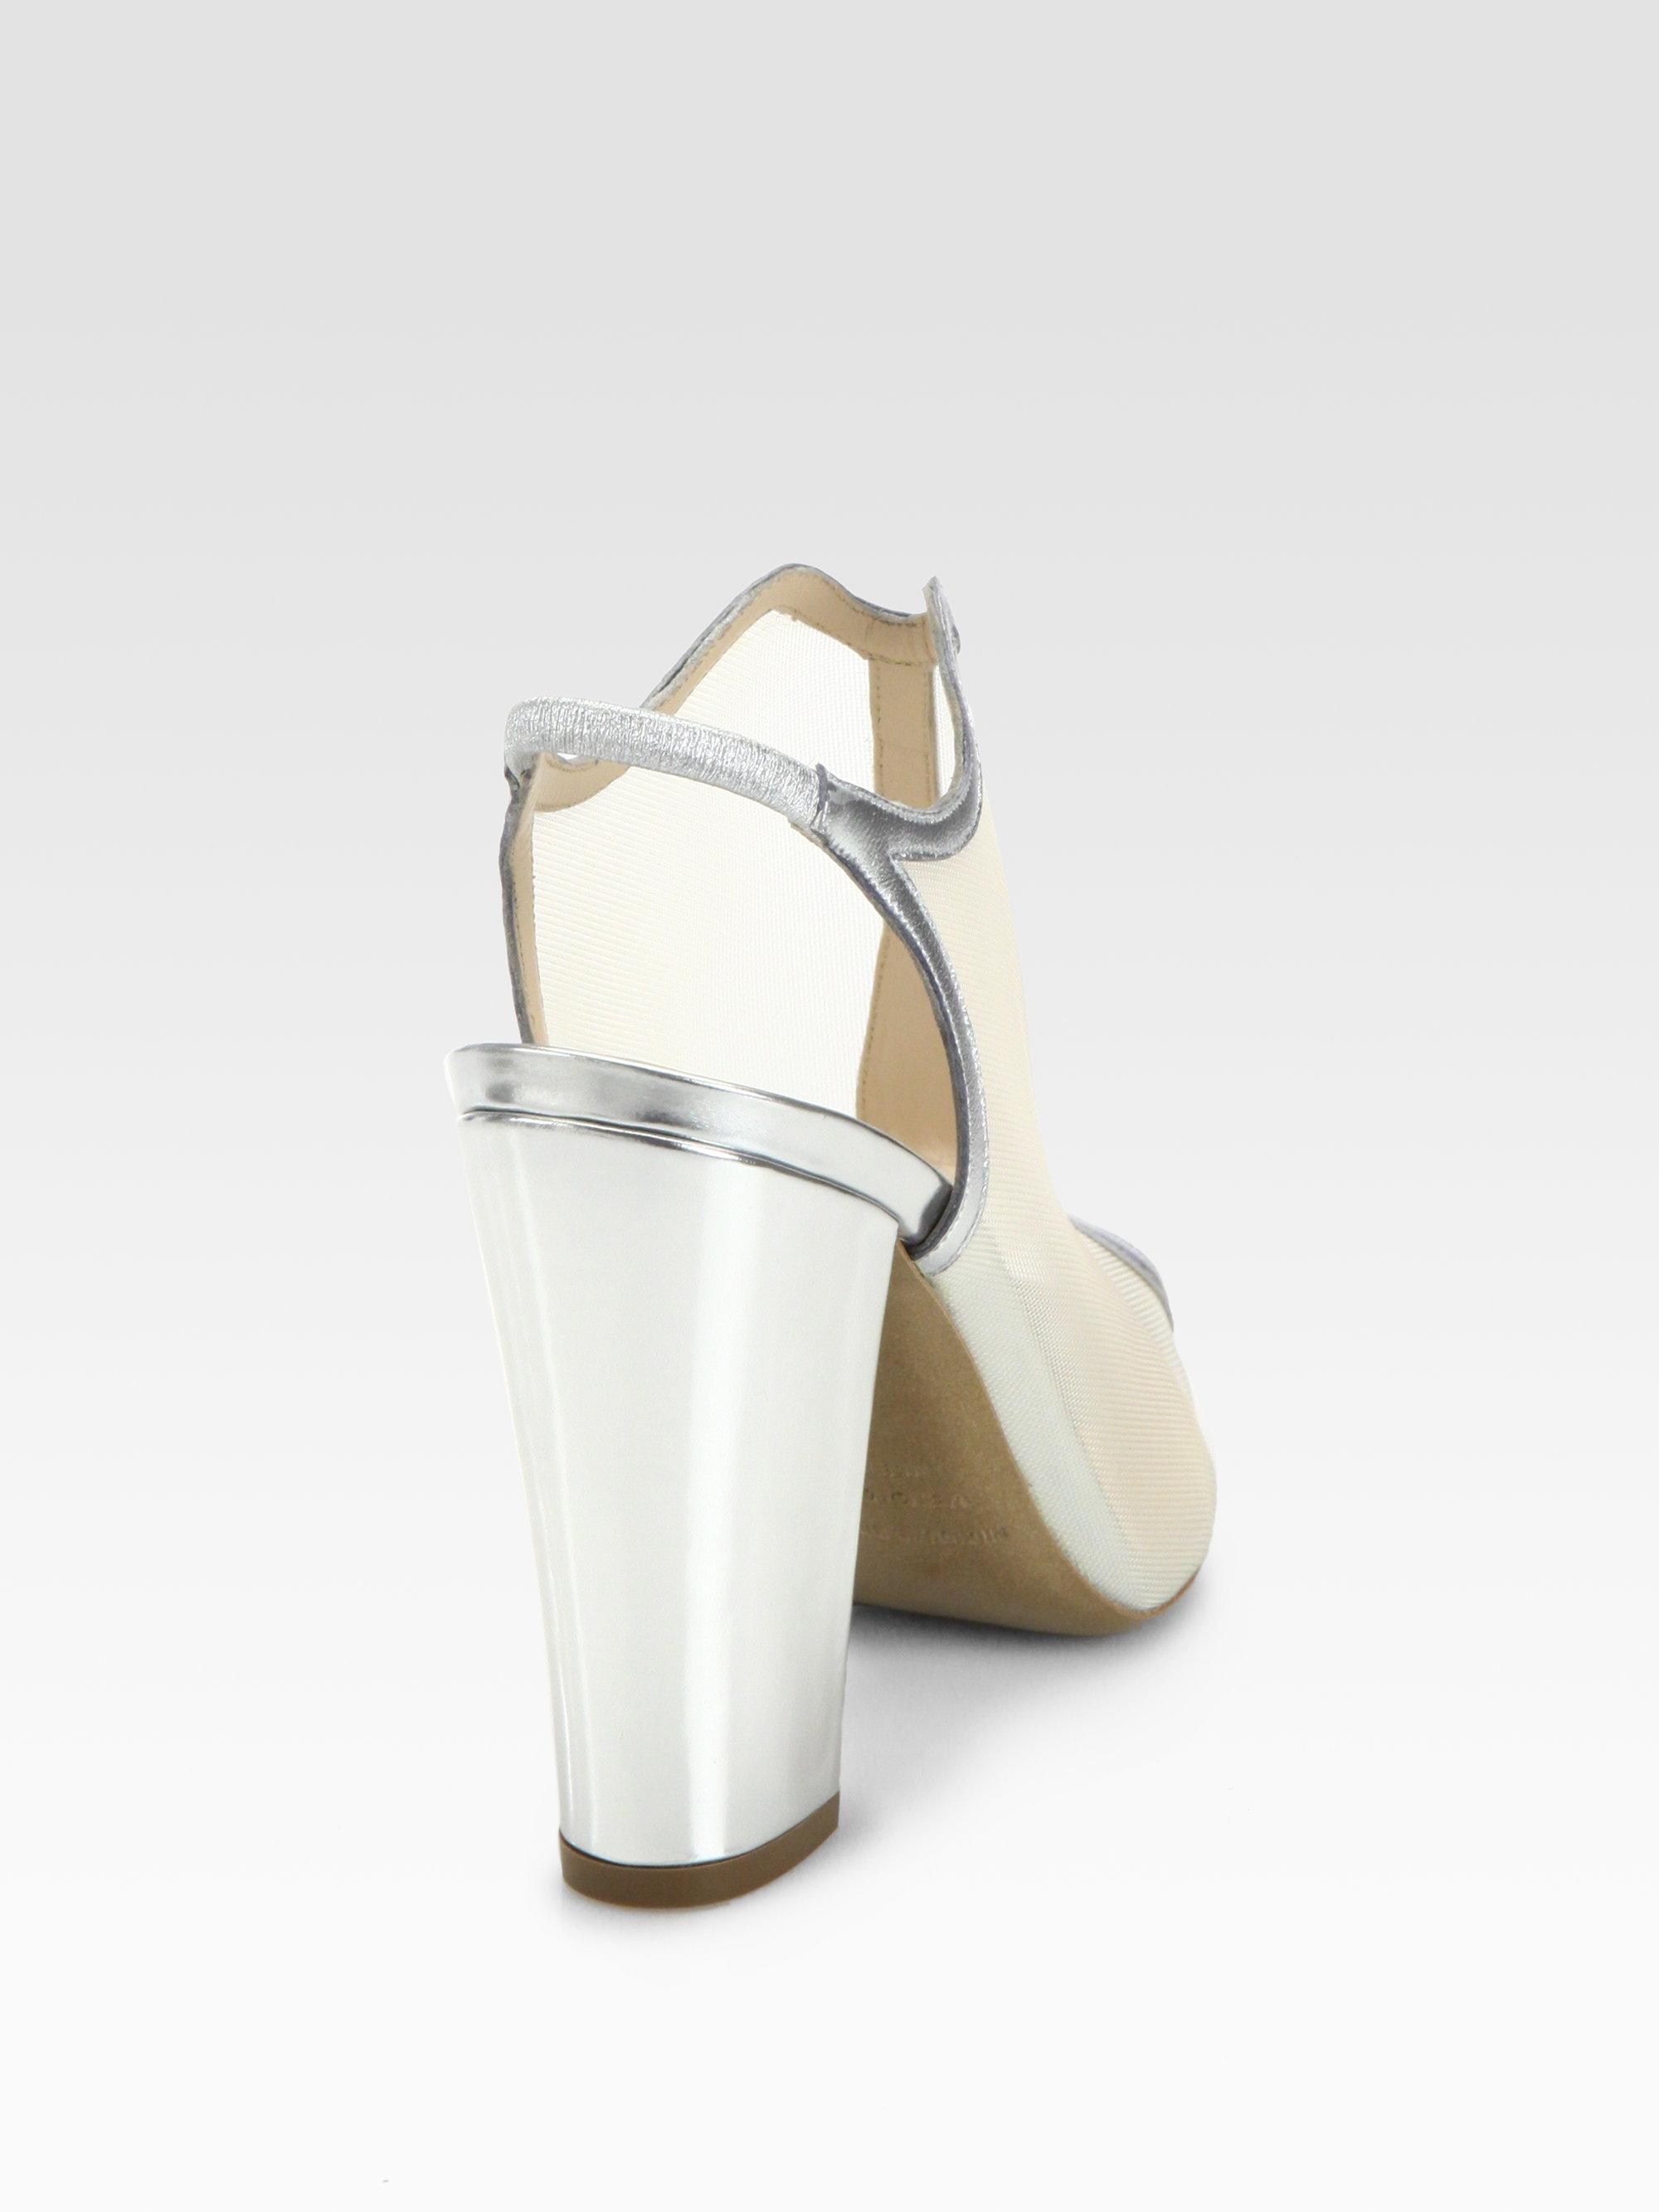 Slingback Ankle Boots September 2017